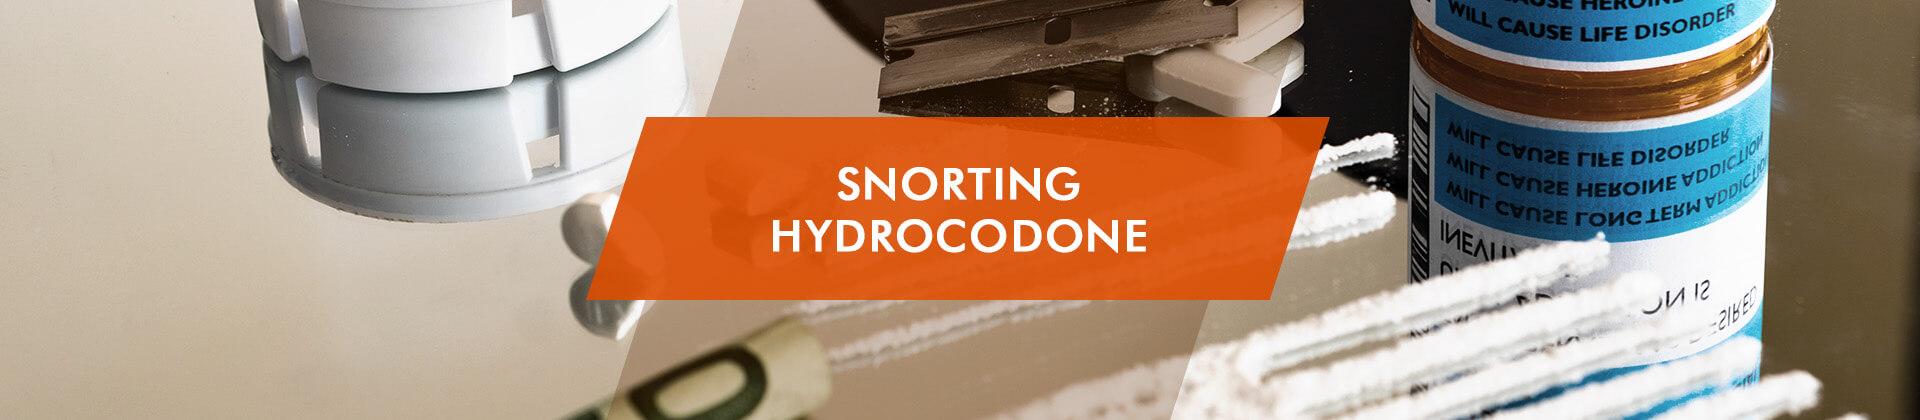 Snorting Hydrocodone